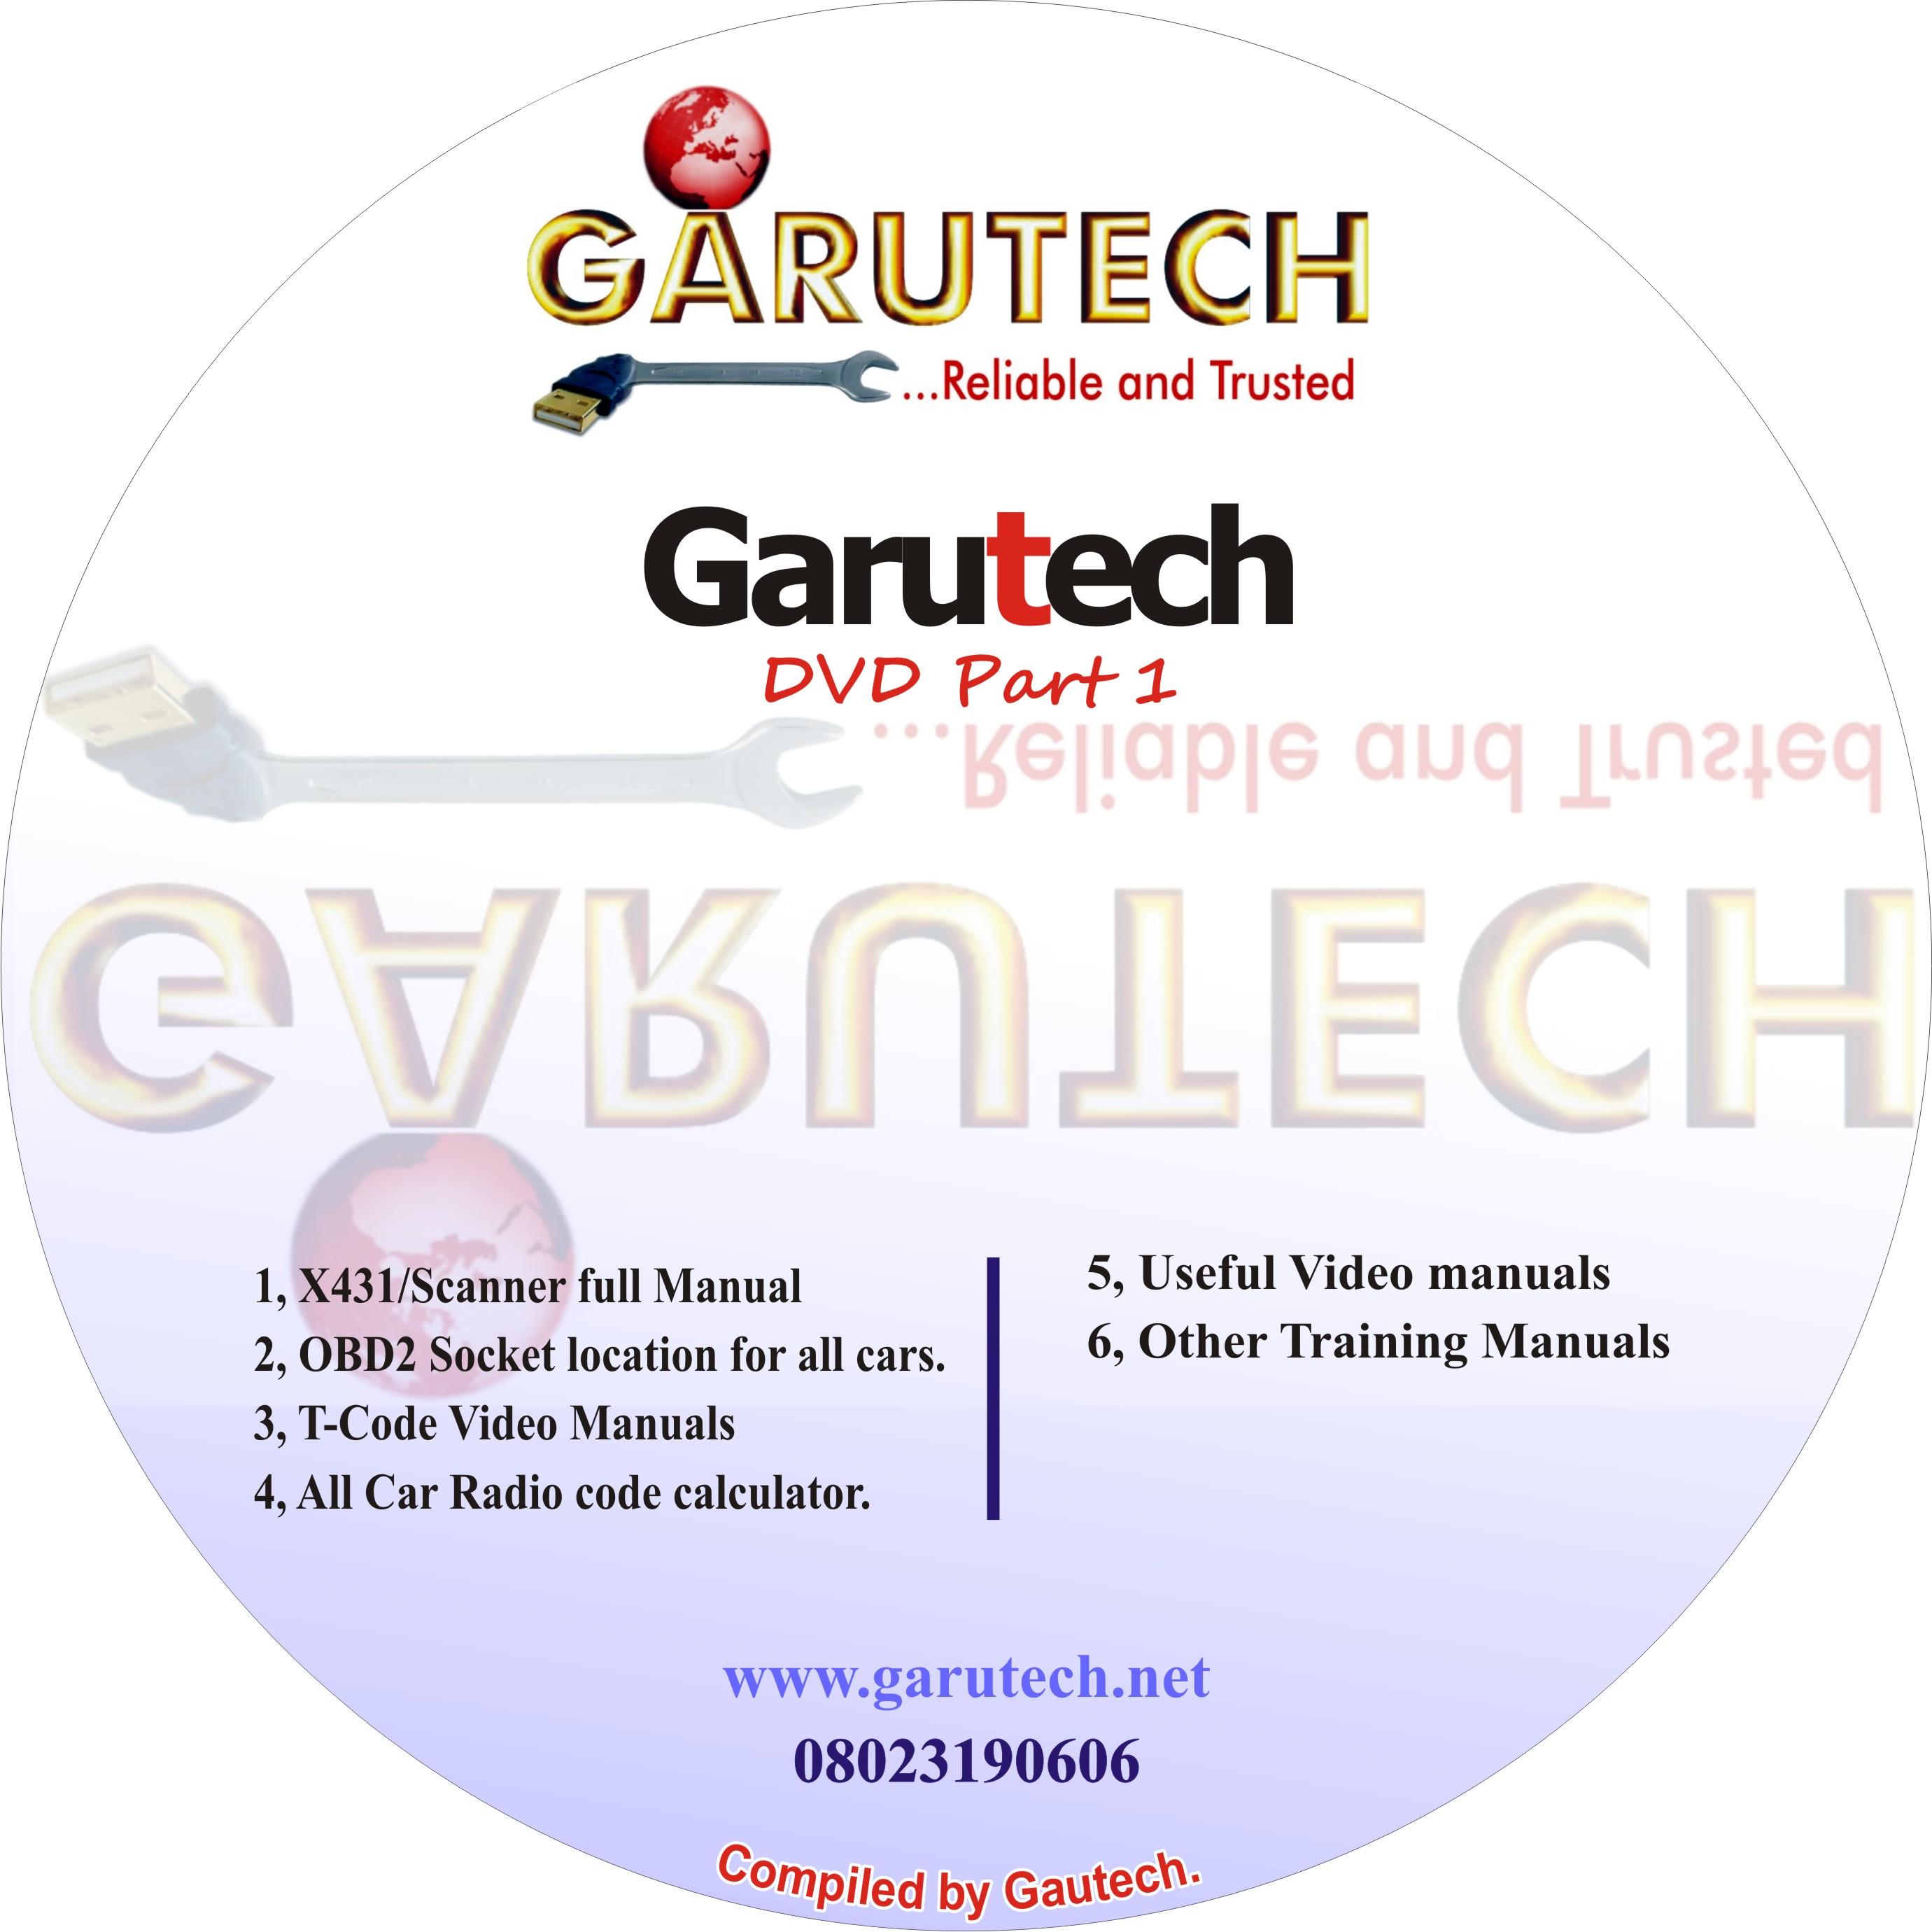 Garutech Automotive DVD compilation + Full Launch X431 Manuals